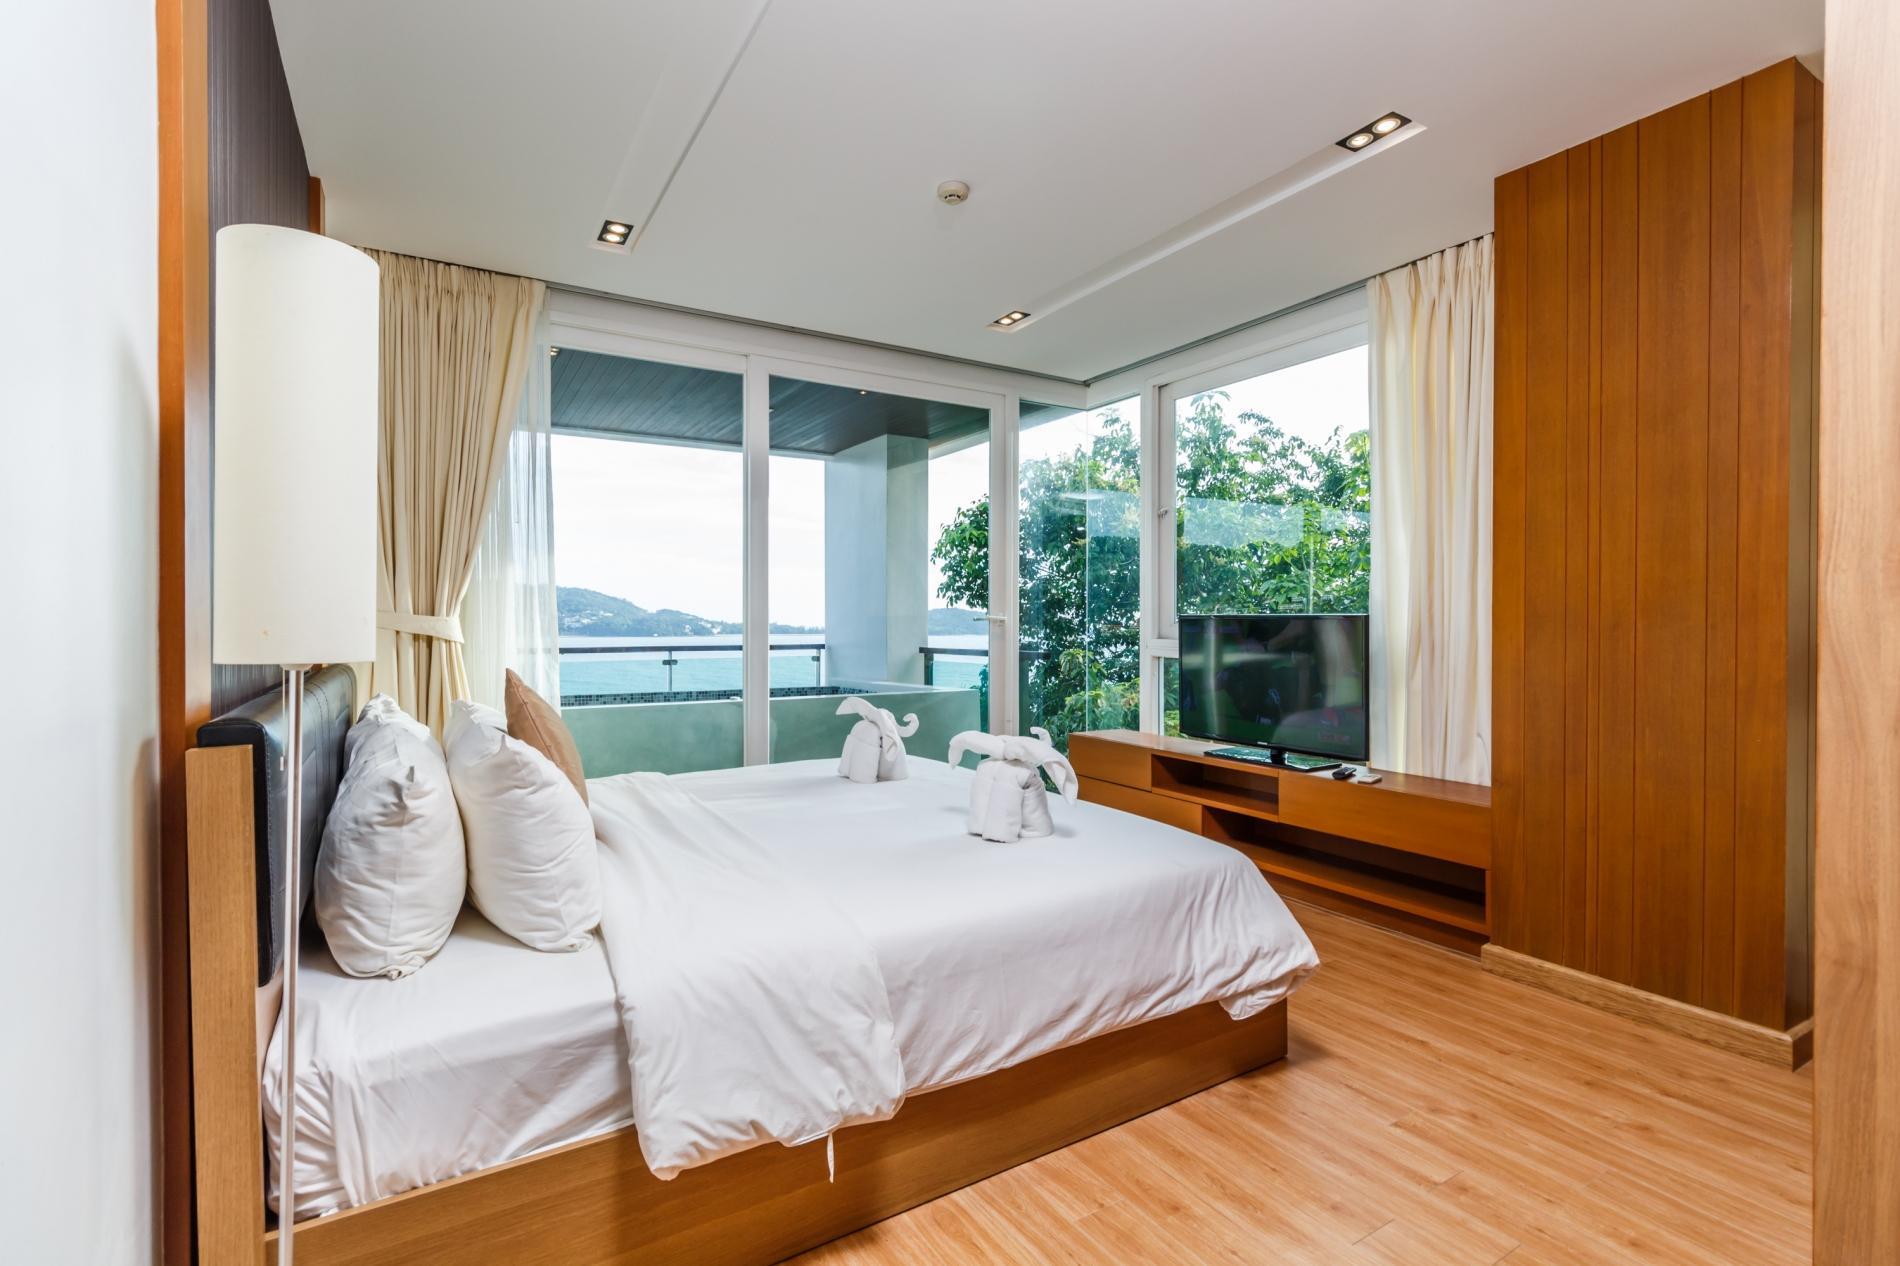 Apartment Privilege12 - Seaview 3 bedroom luxury apartment on Kalim bay photo 20319611